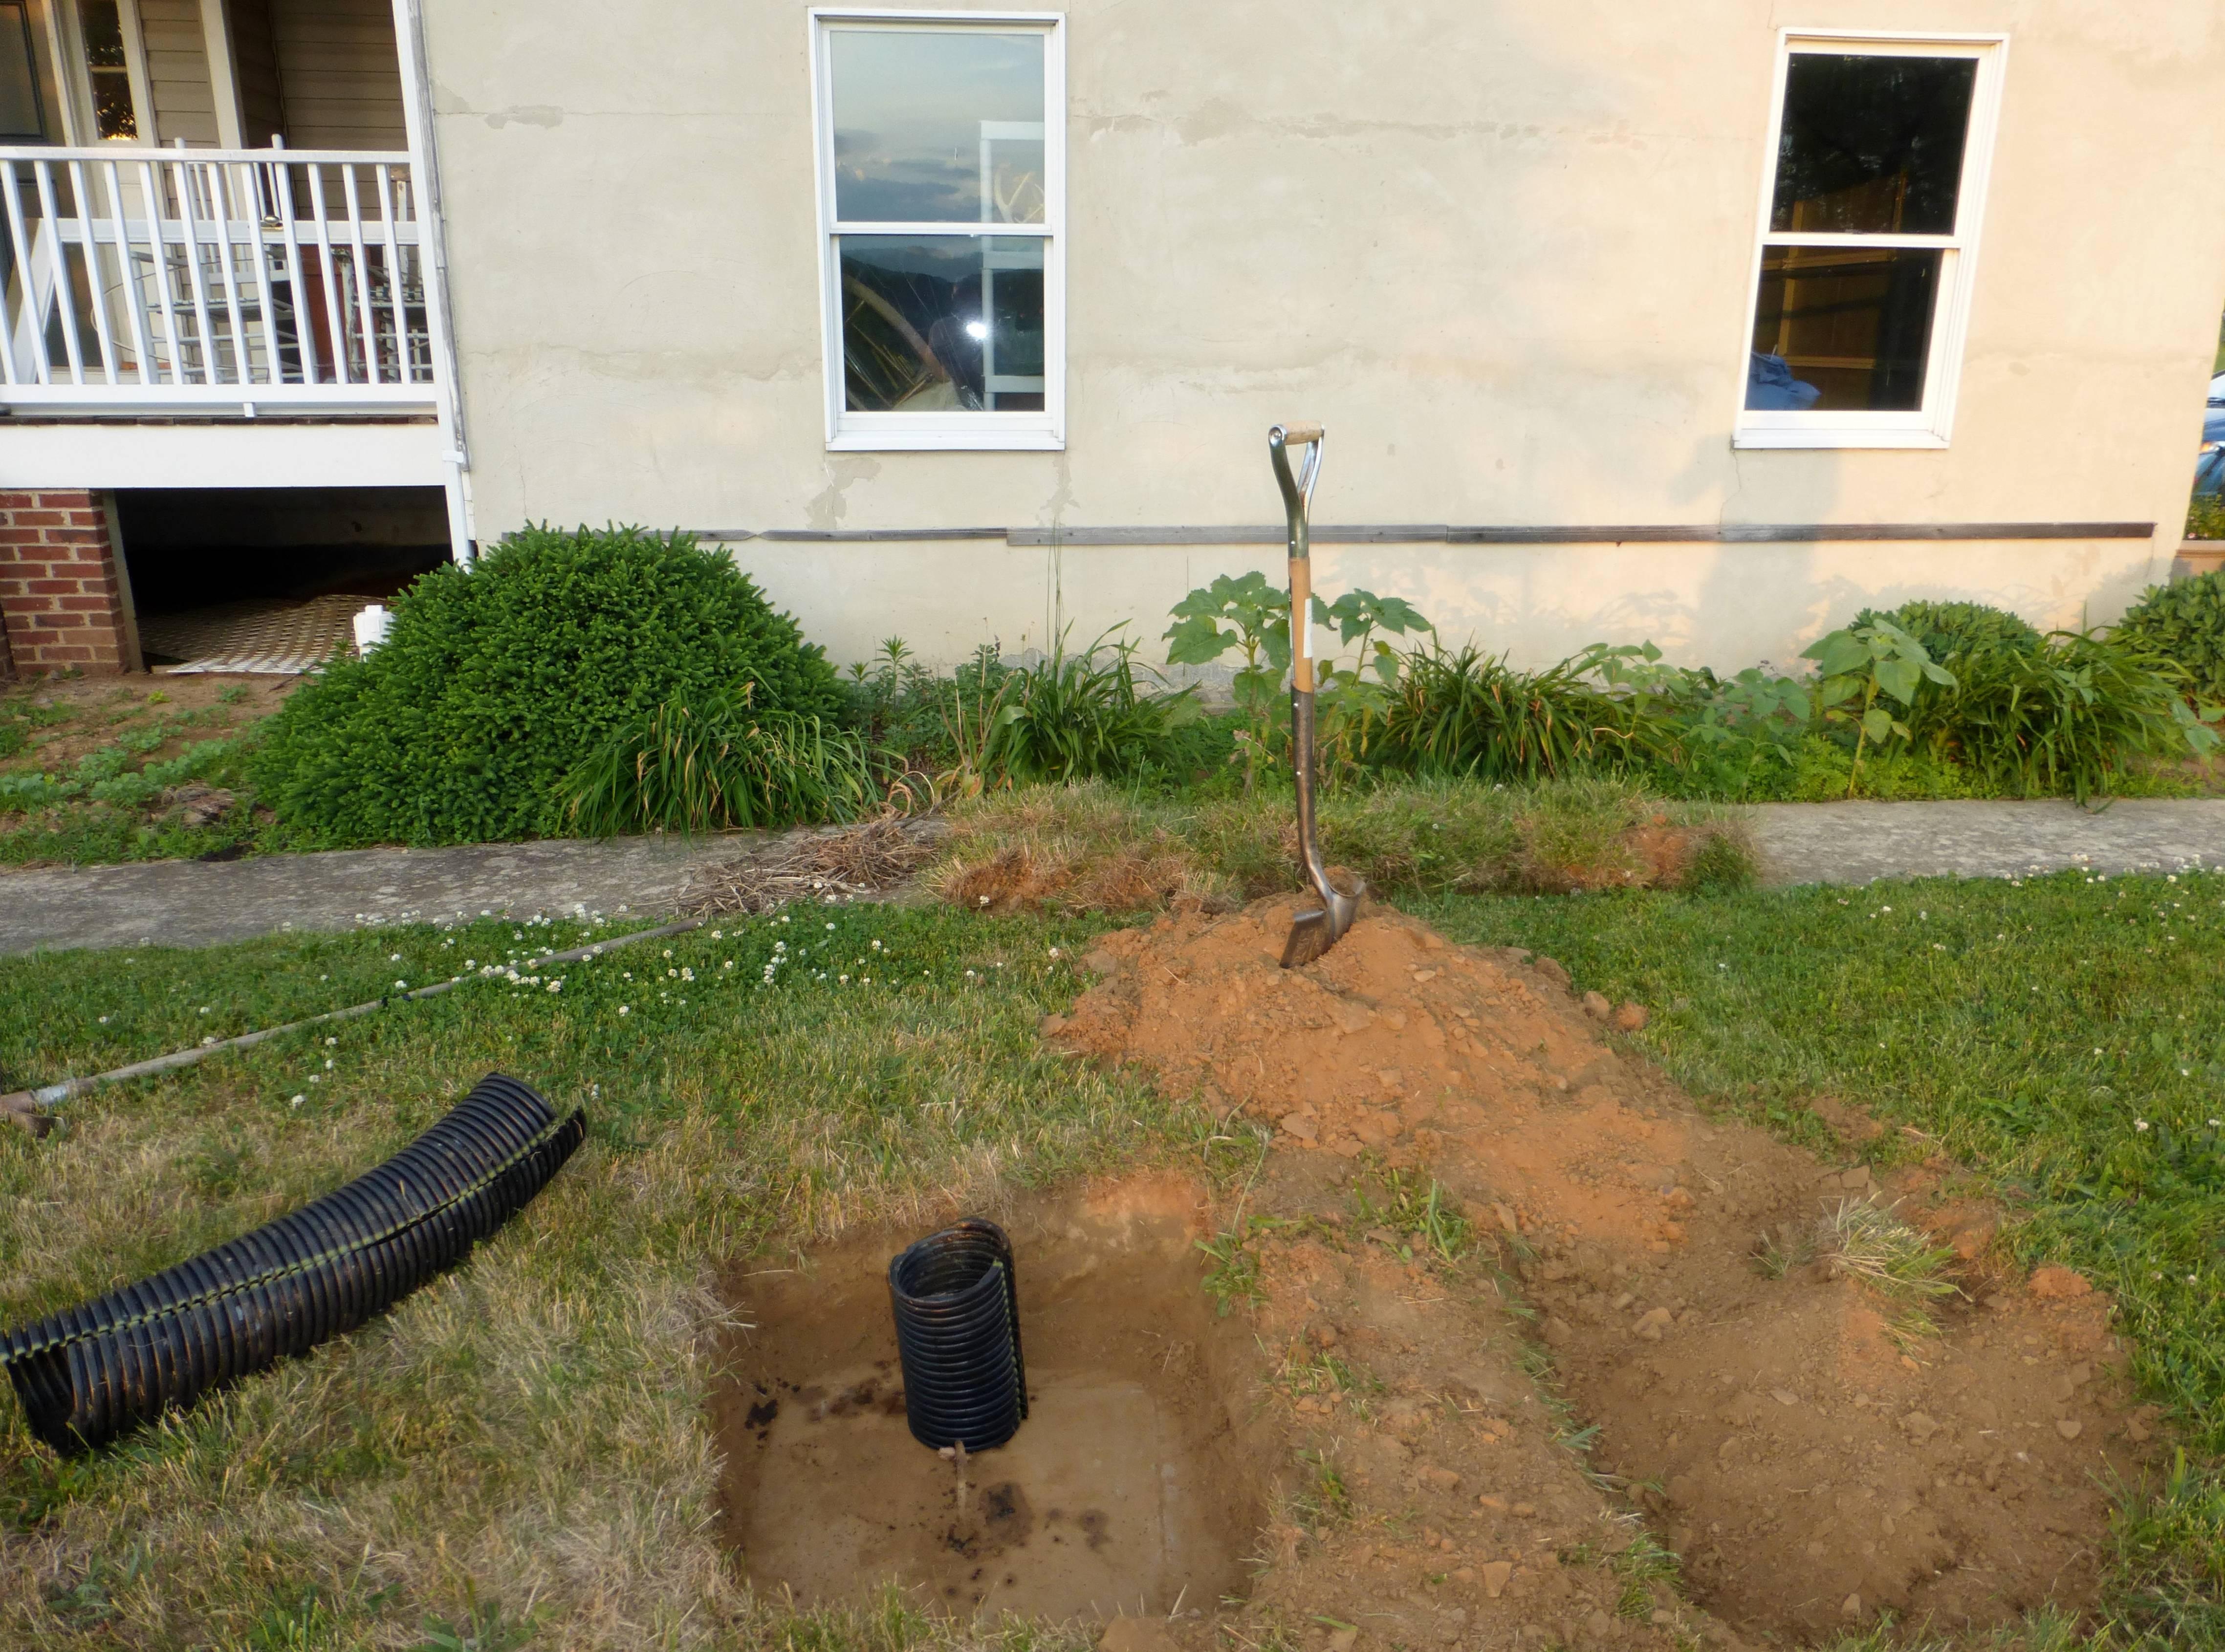 septic tank maintenance and money saving tips - Septic Tank Maintenance